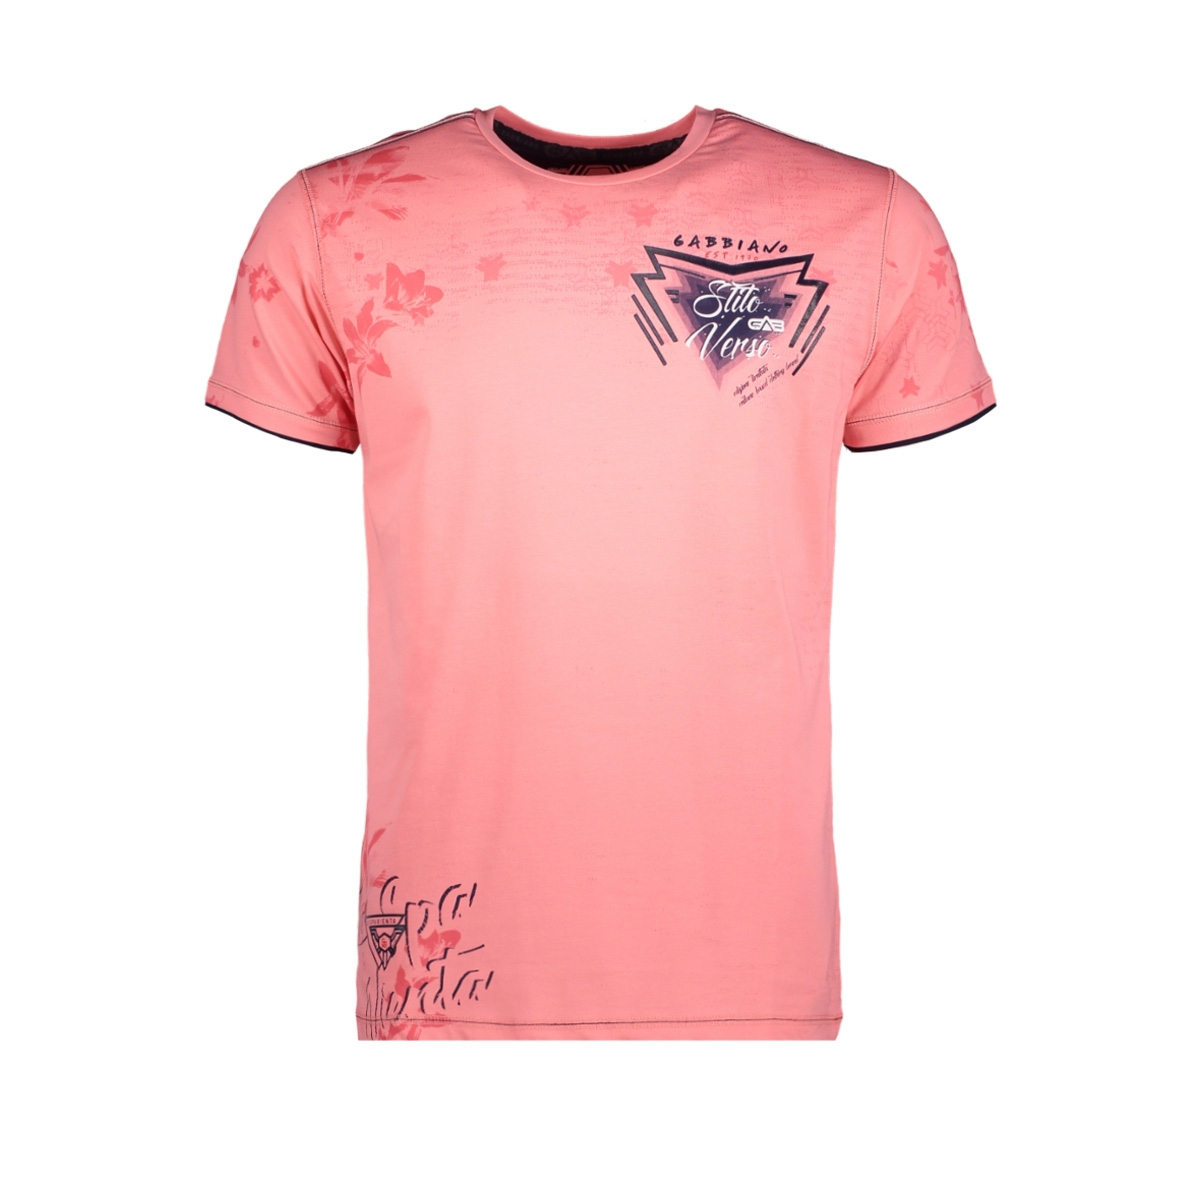 13896 gabbiano t-shirt salmon pink